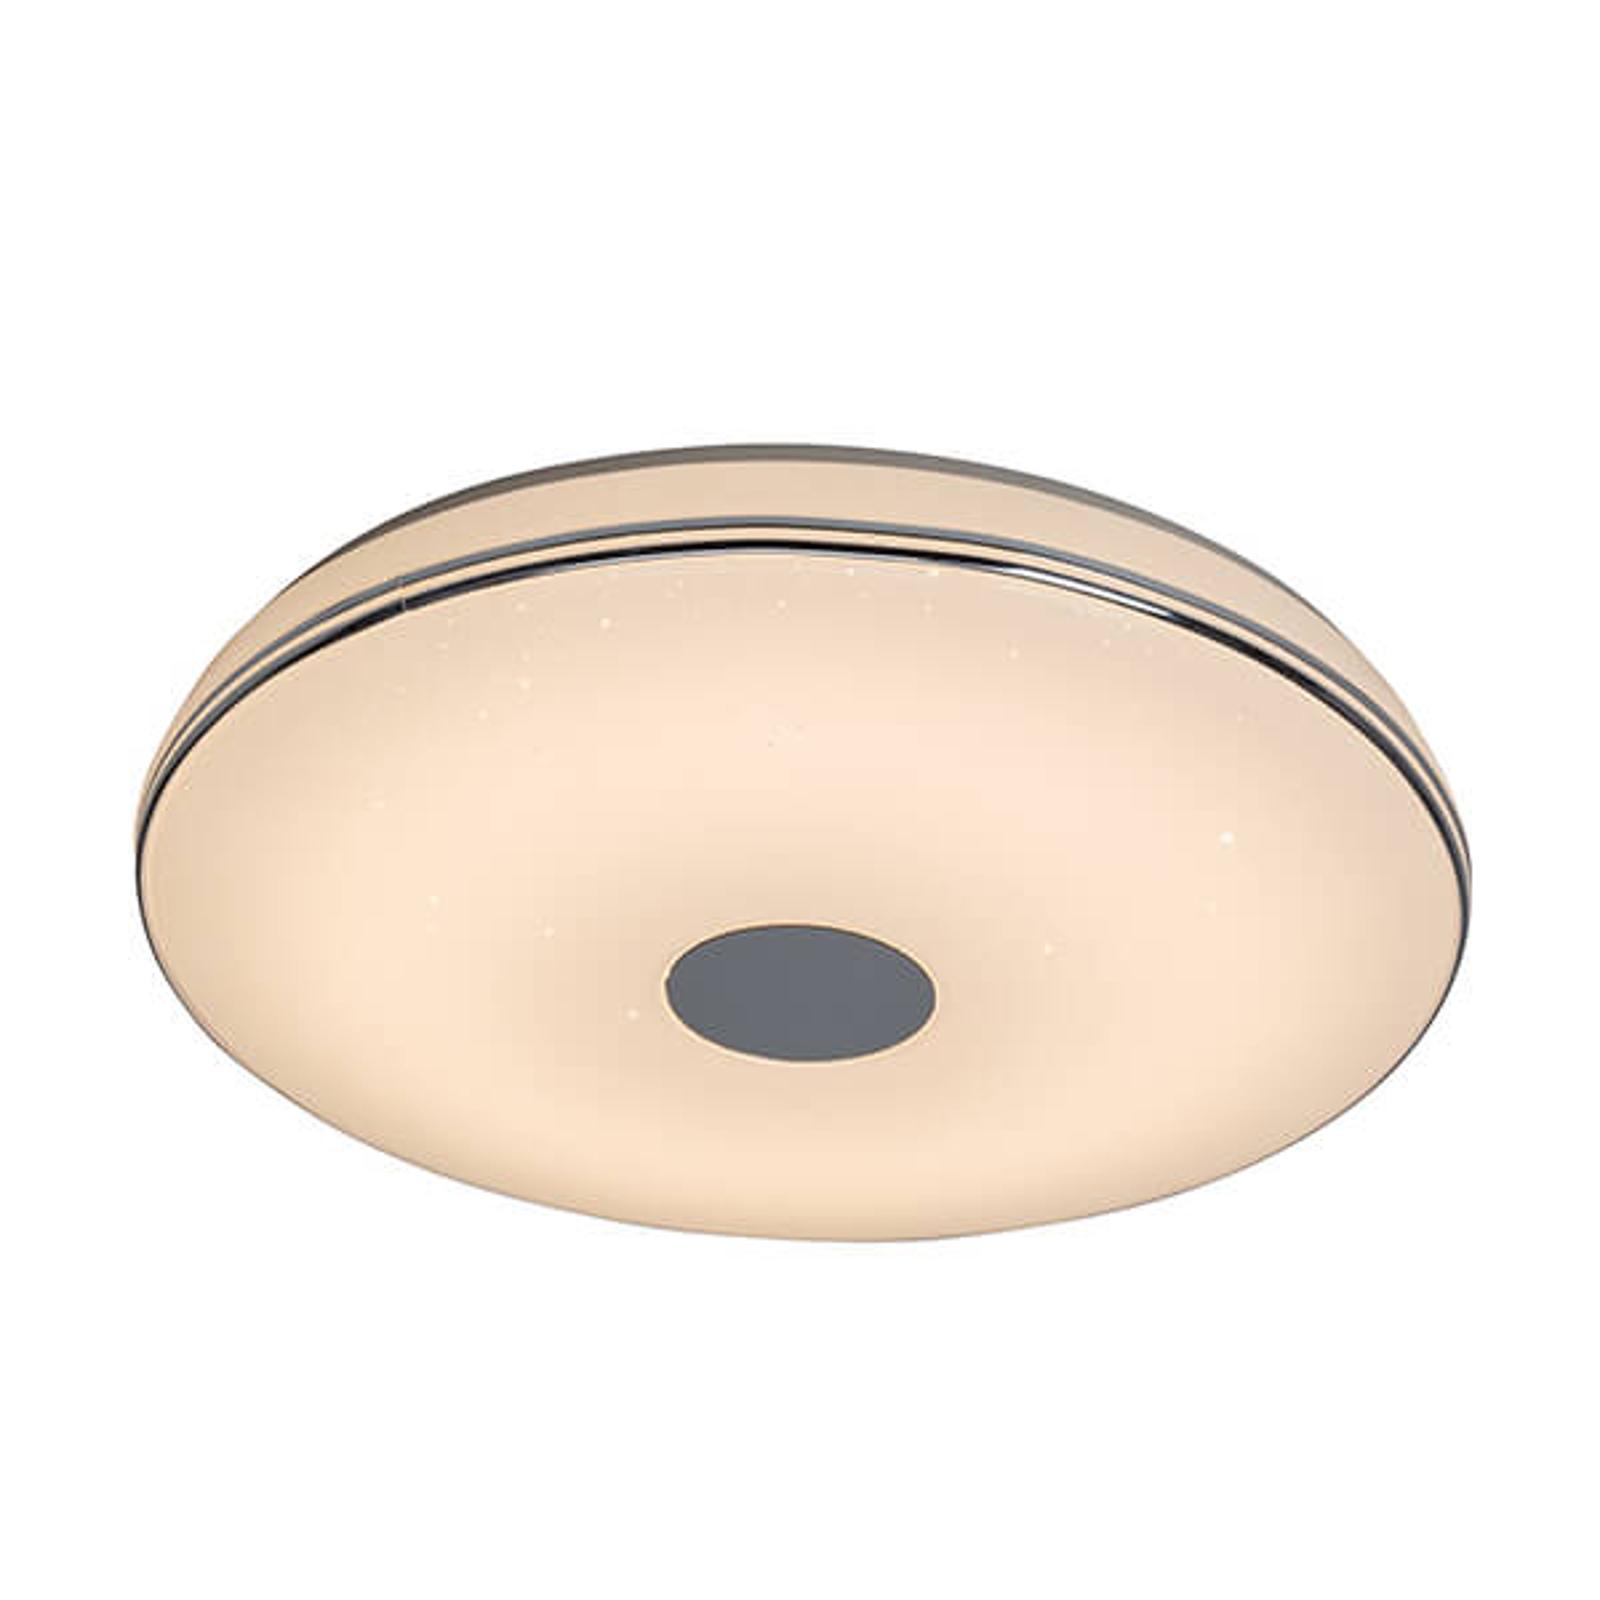 AEG Mono Deco - variable LED-Deckenlampe mit FB